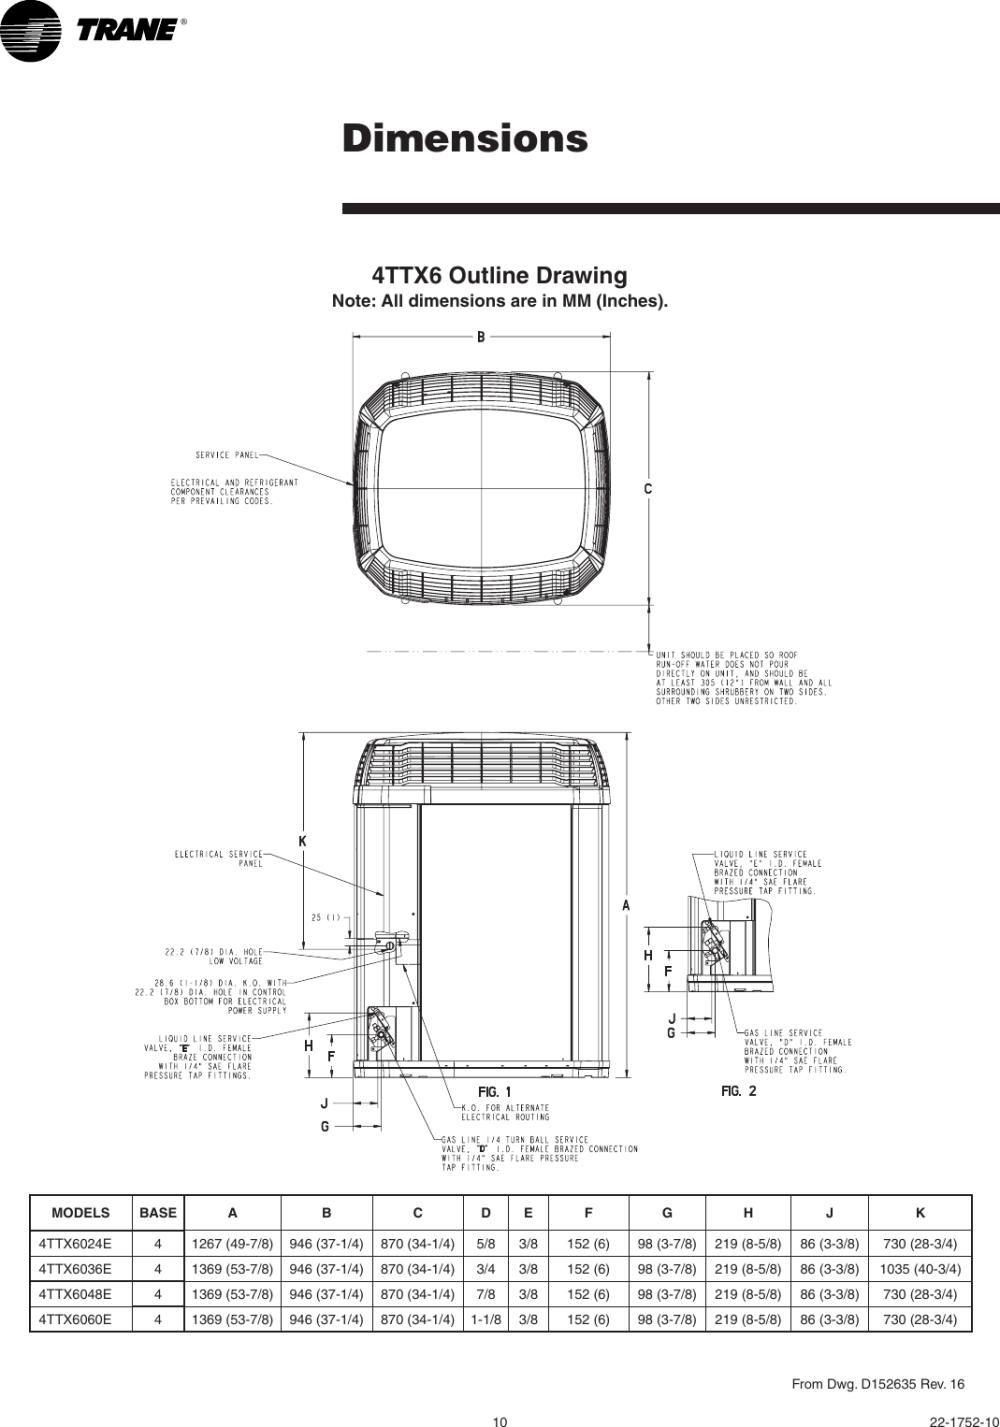 medium resolution of page 10 of 12 trane trane 4ttx6024 036 048 and